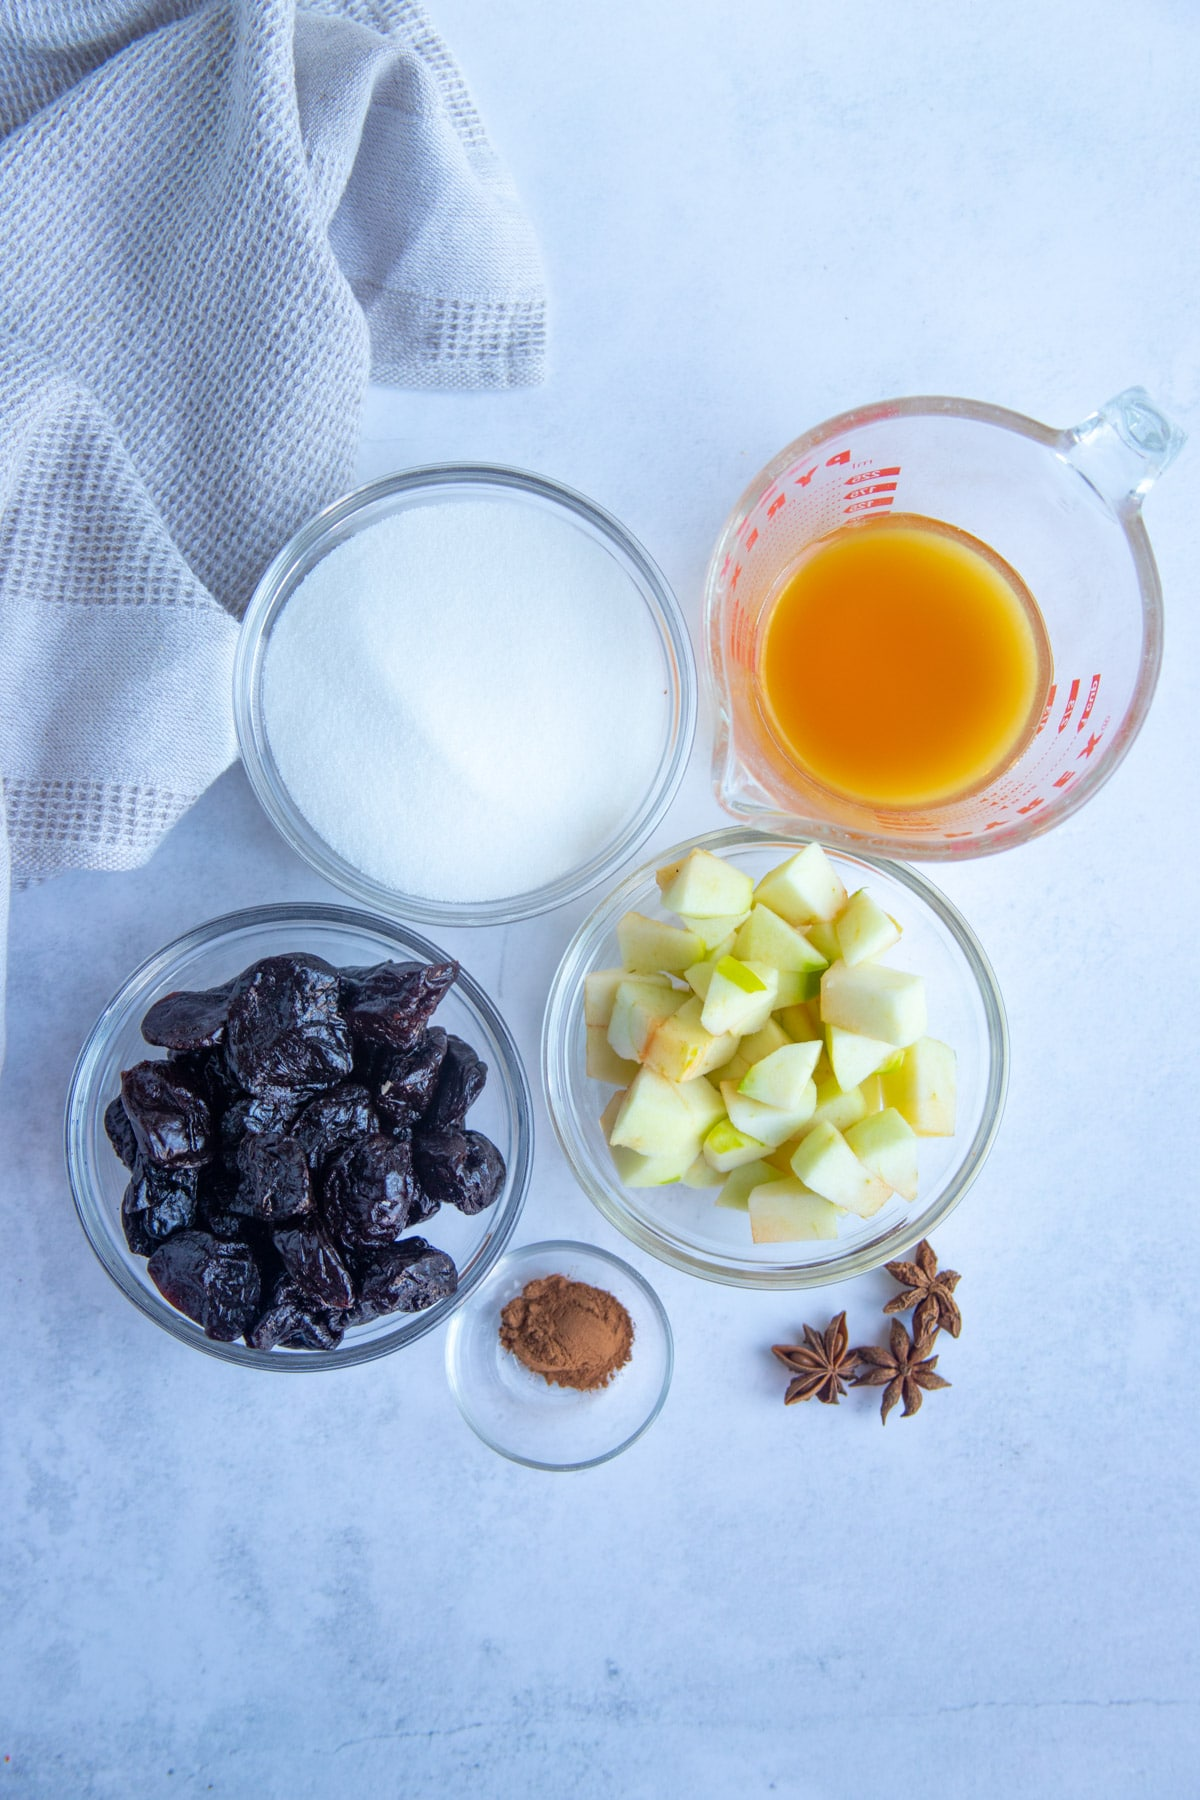 Prunes, Chopped Apple, Sugar, Apple Cider, Spices